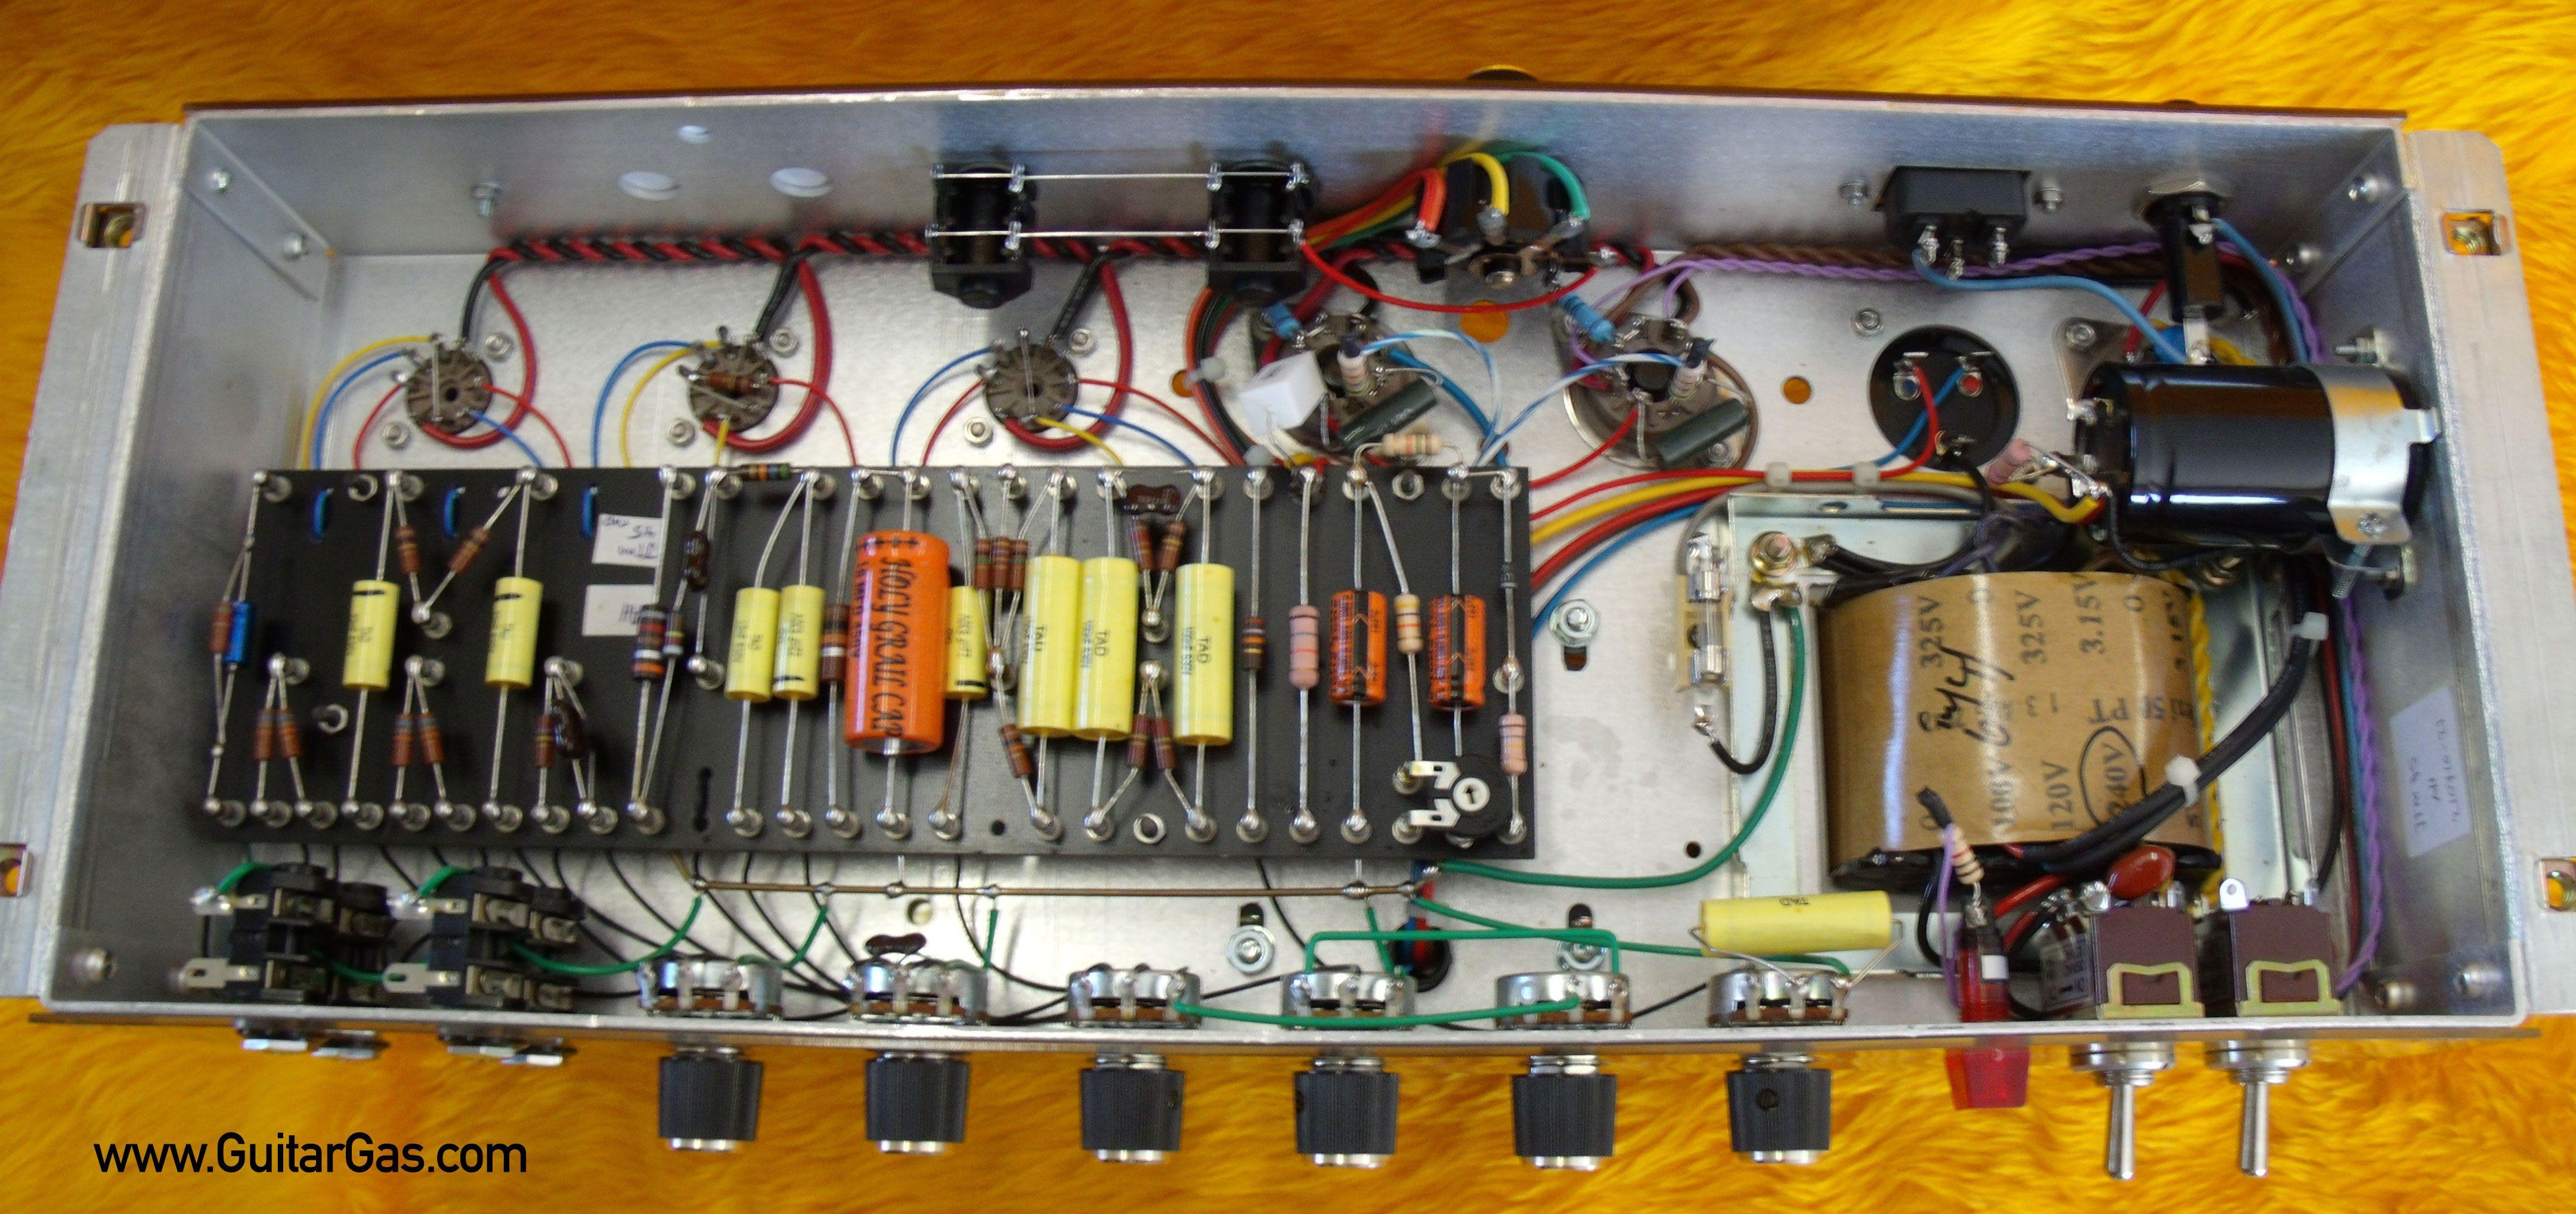 Ceriatone Jtm45 Inside Gut Shot 2 Clone 1929 Rca Theremin Vintage Radio Wiring Diagram Binatanicom